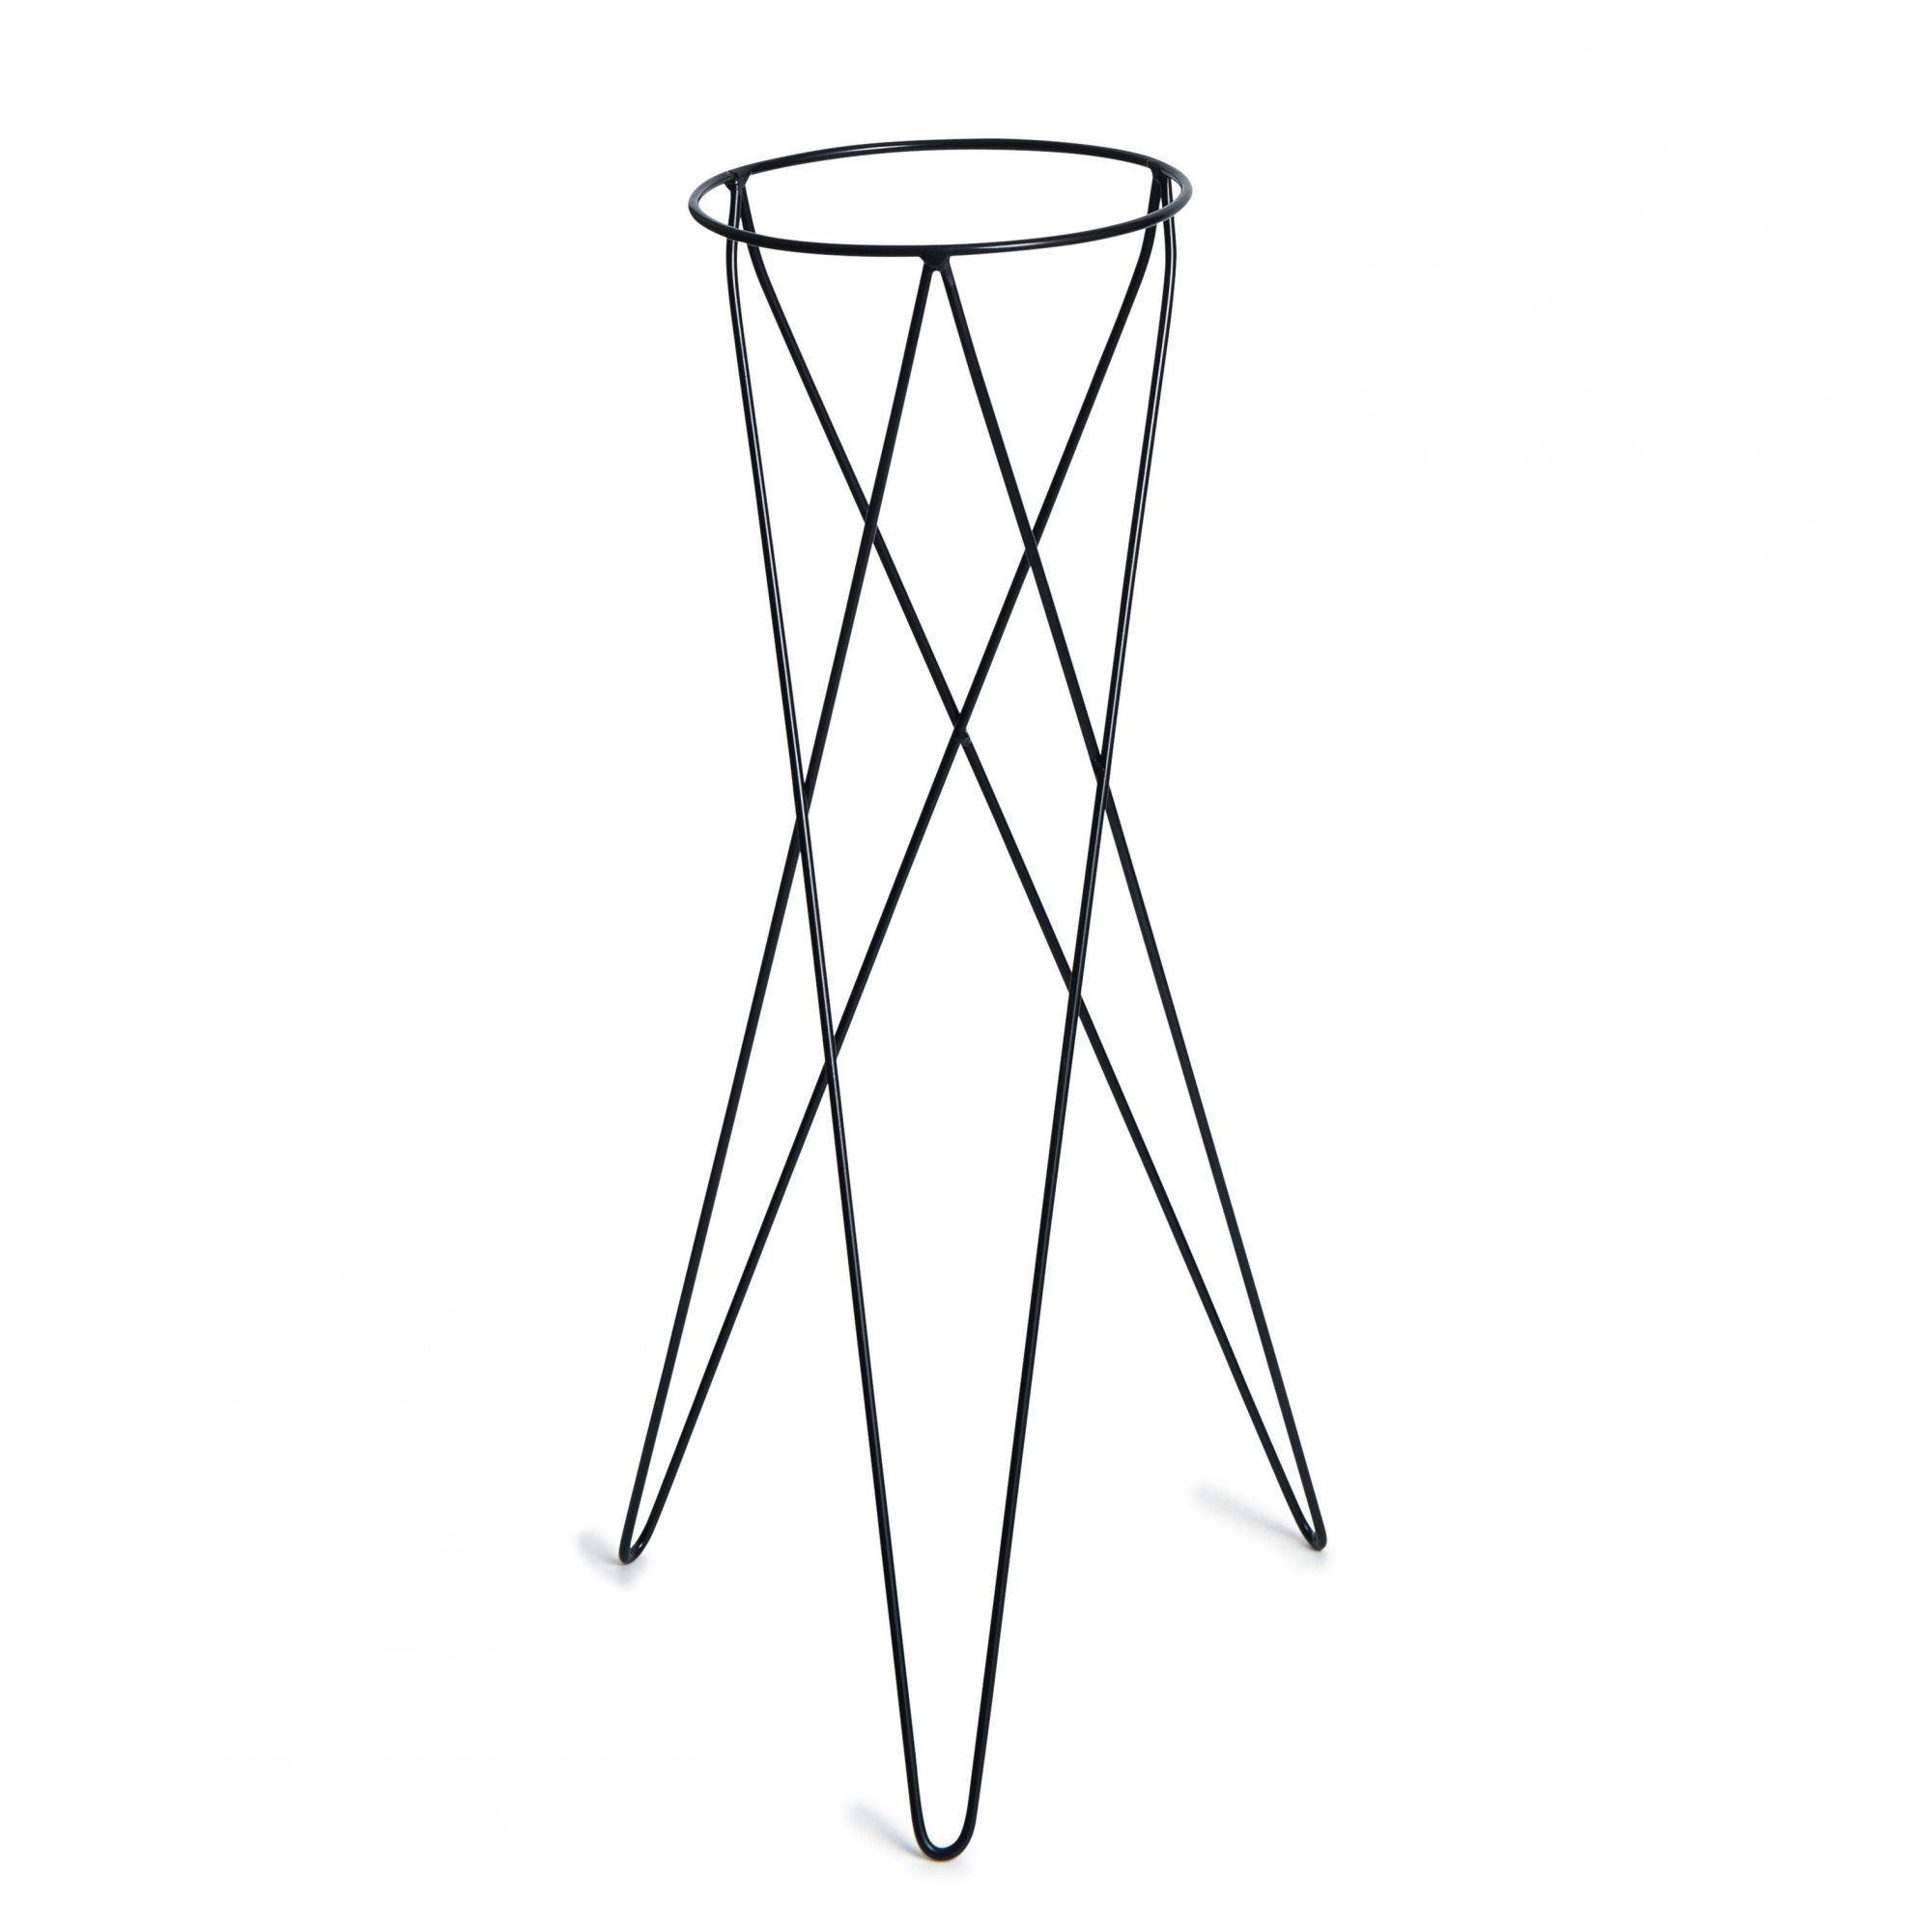 Suporte Tripé Metálico Preto 60cm para Vaso Autoirrigável Grande N04 Raiz